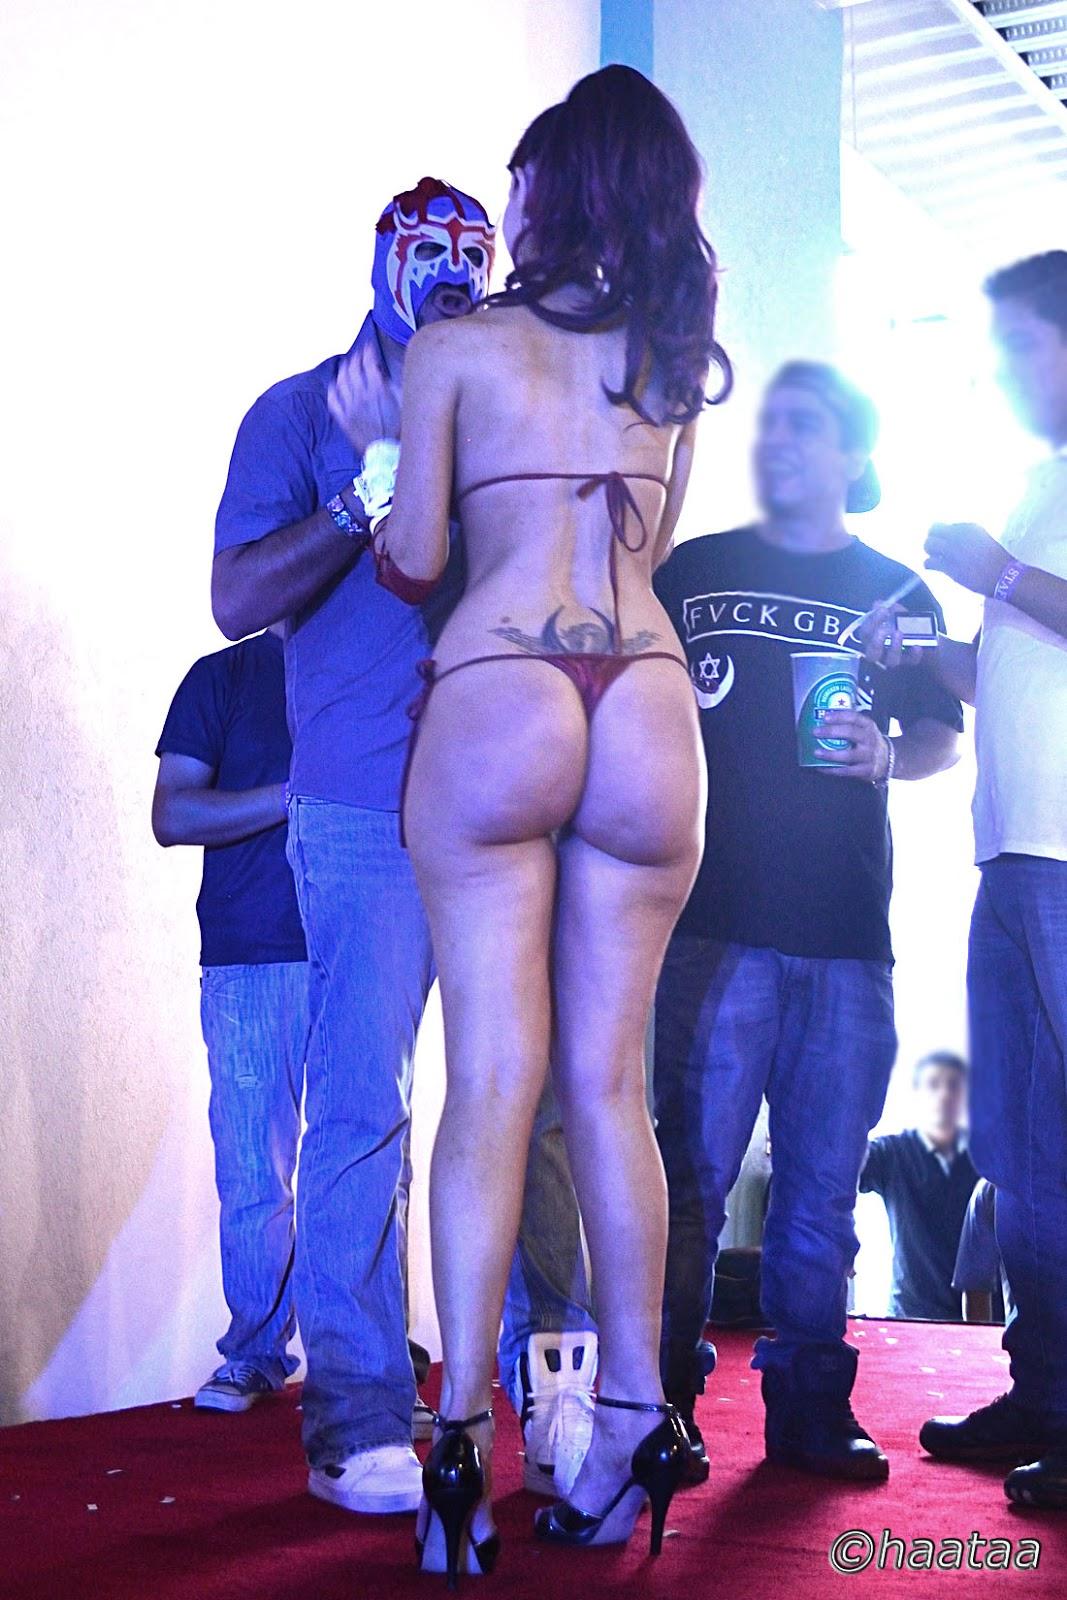 oversized butt